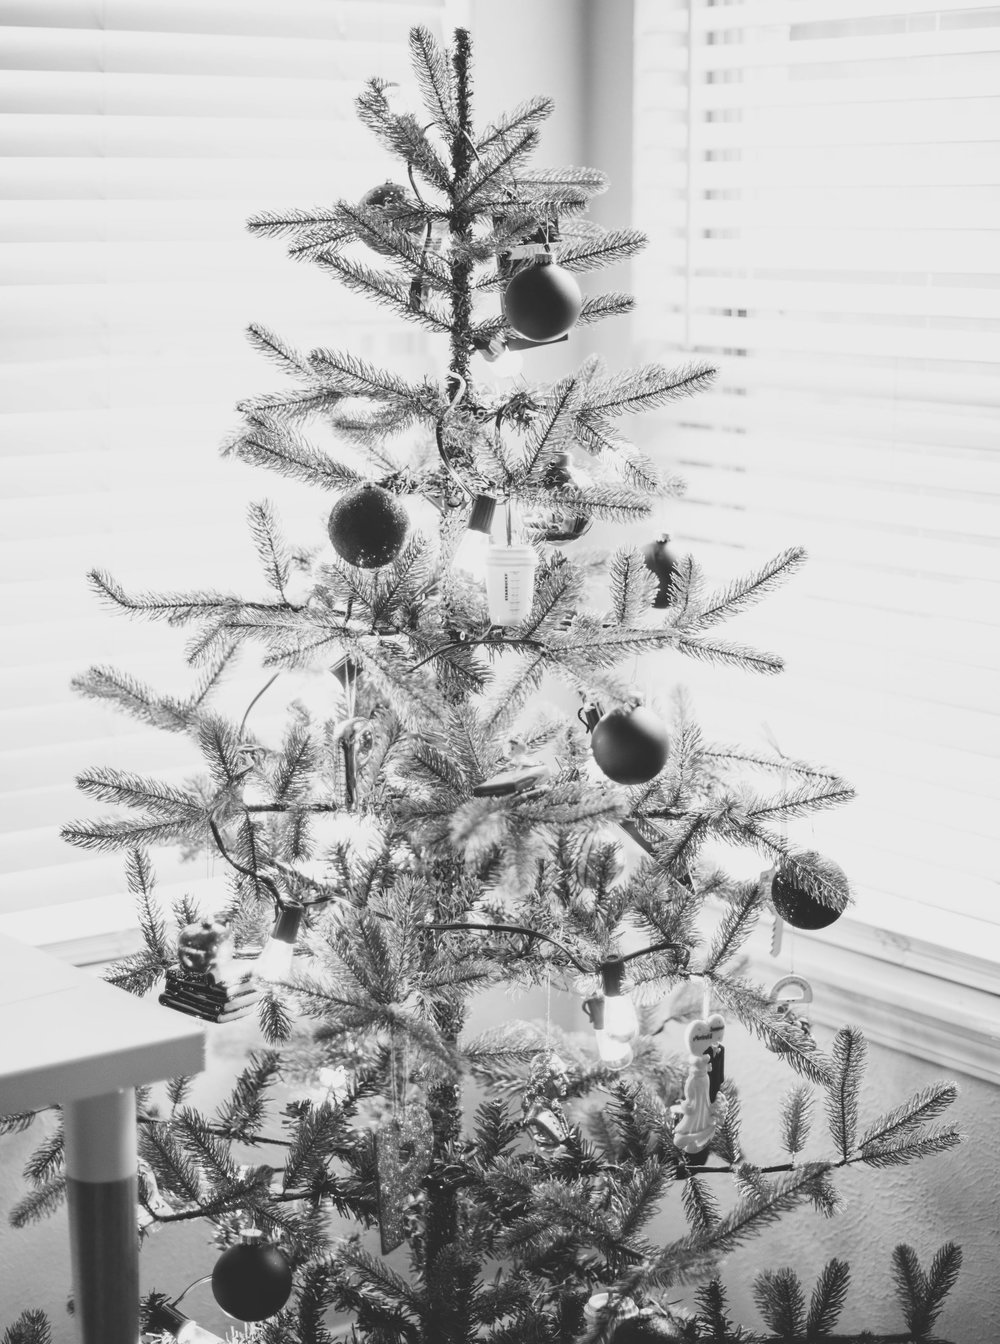 holiday-winter-decorations-28.jpg